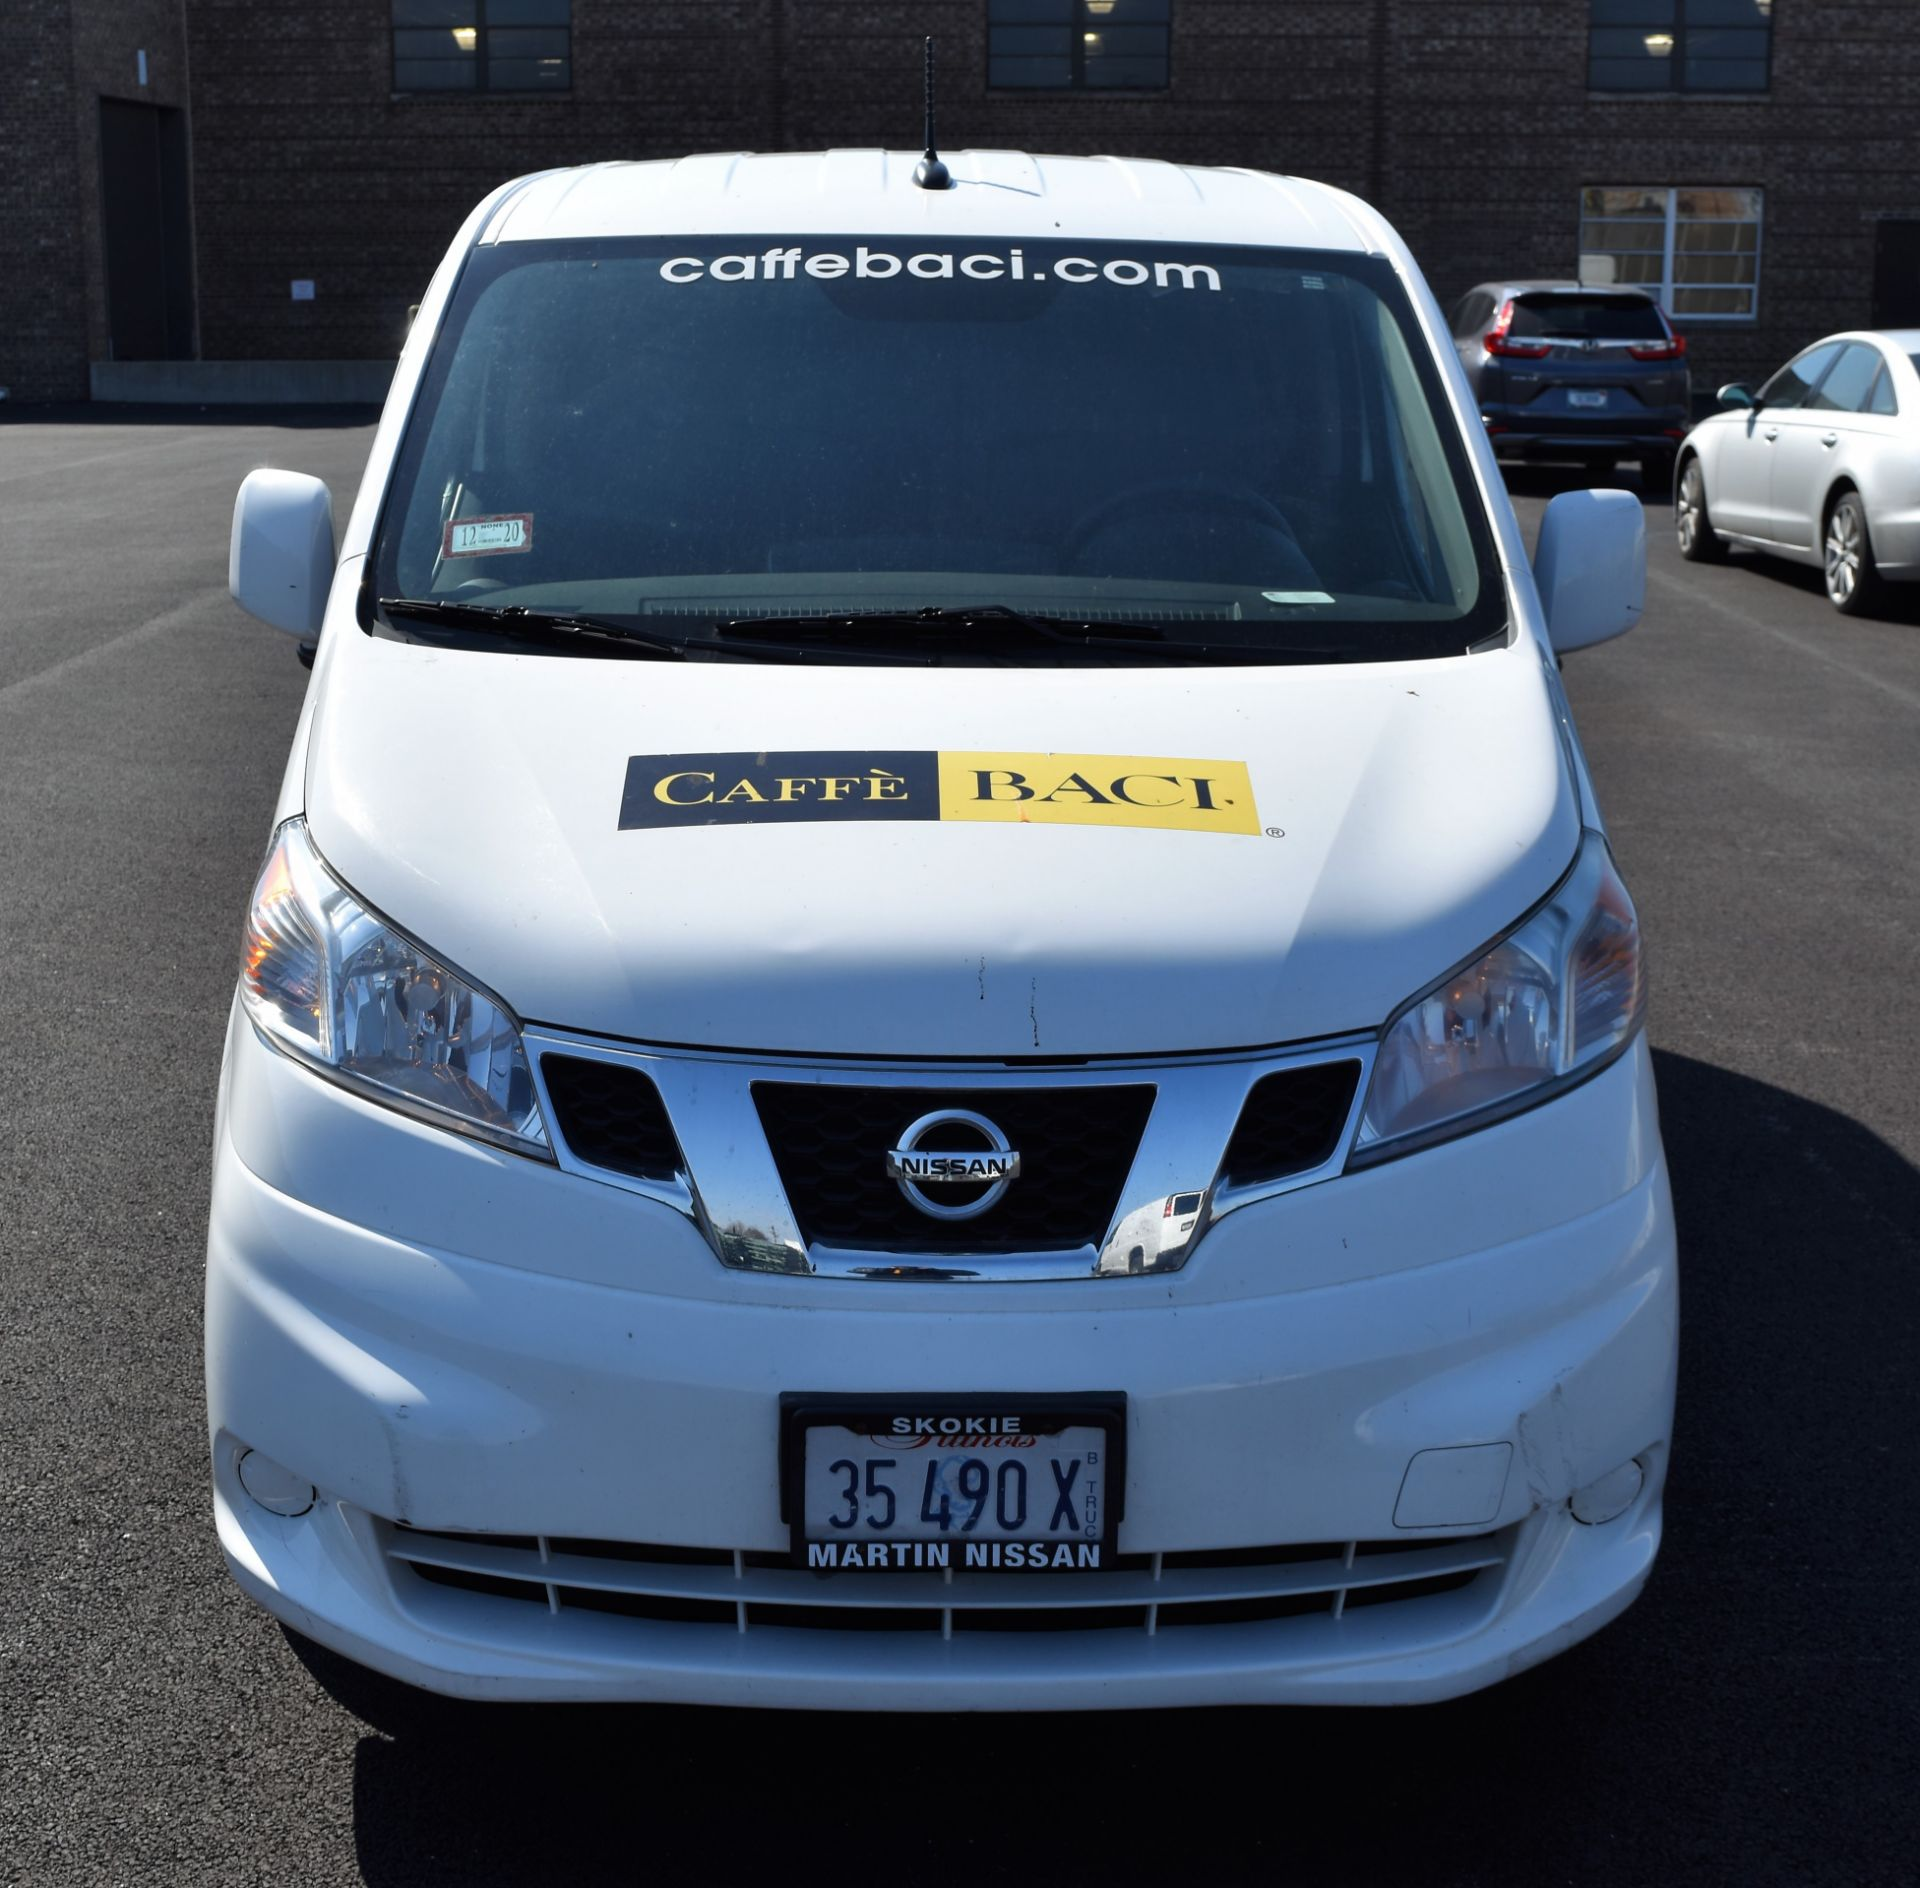 2013 Nissan NV200 Delivery Van - Image 46 of 54